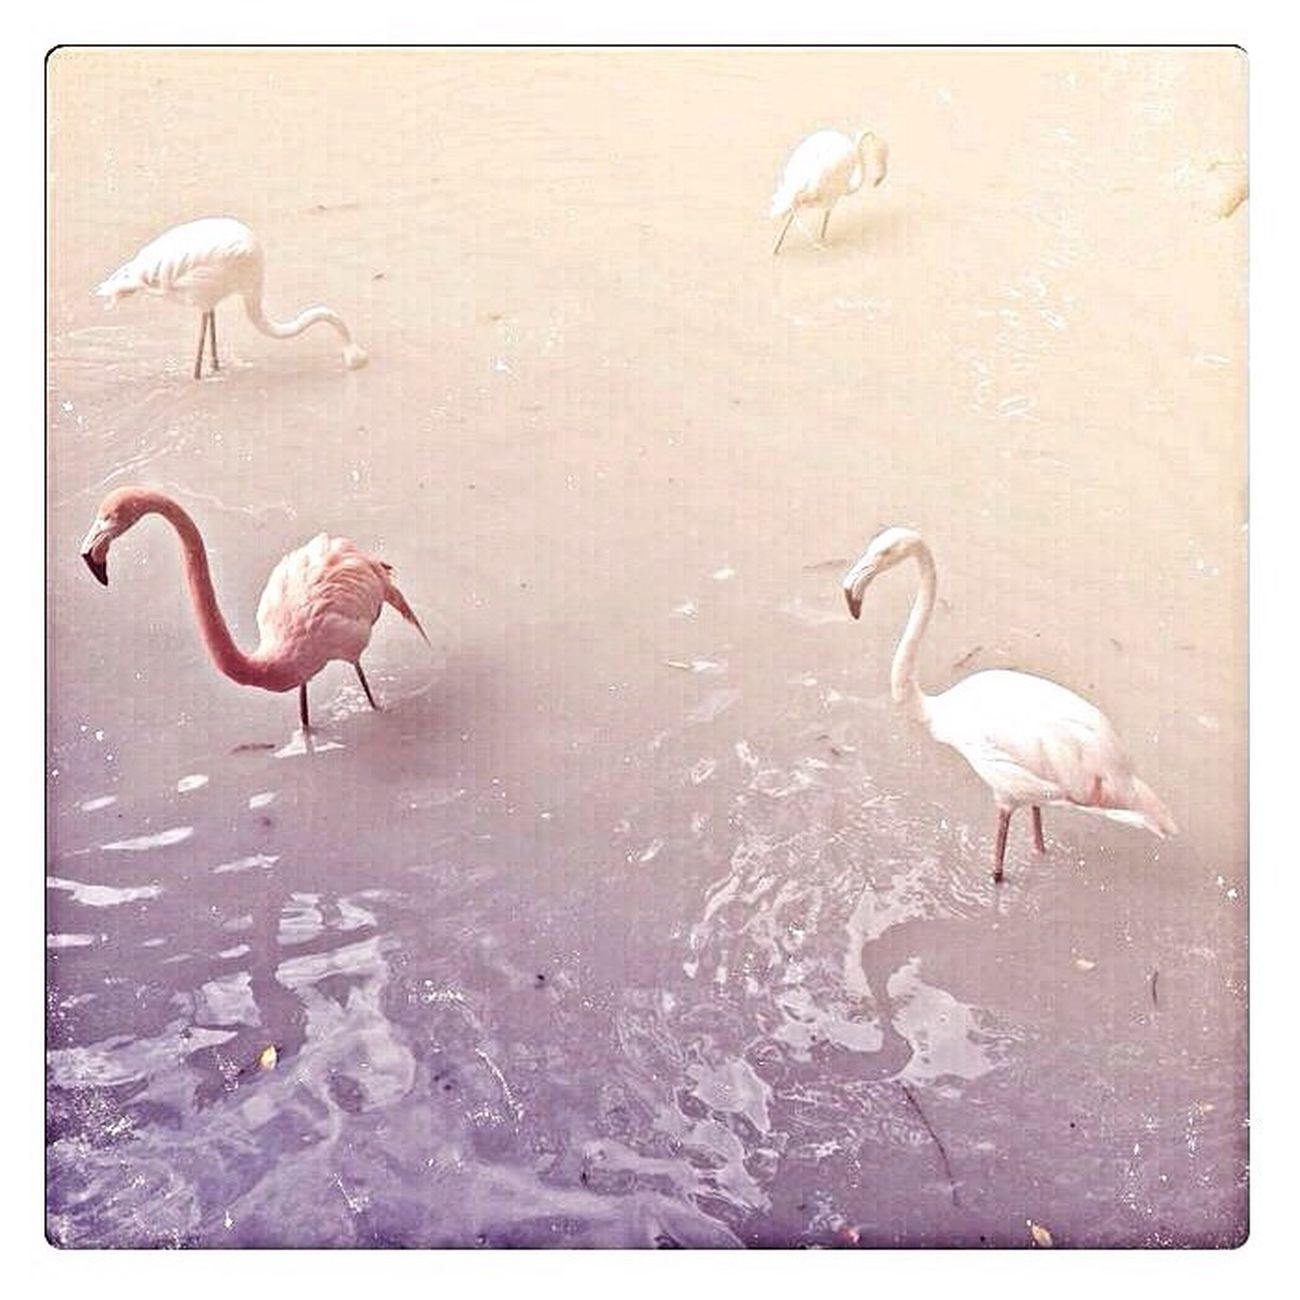 Birds киевскийзоопарк Киев Kiev